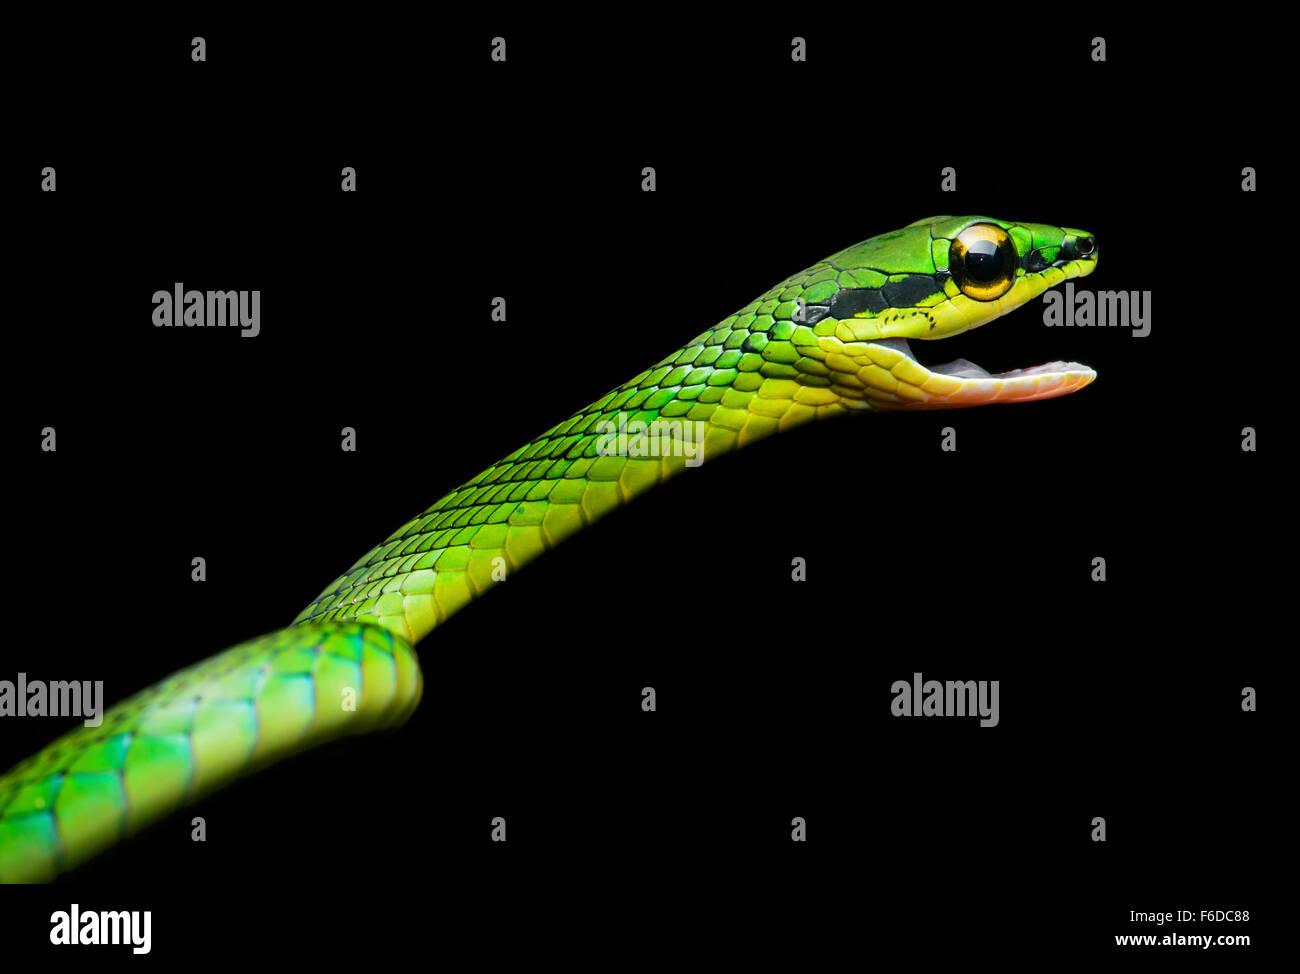 Cope Vine Snake (Oxybelis brevirostris), (Colubridae family), Chocó rainforest, Ecuador - Stock Image